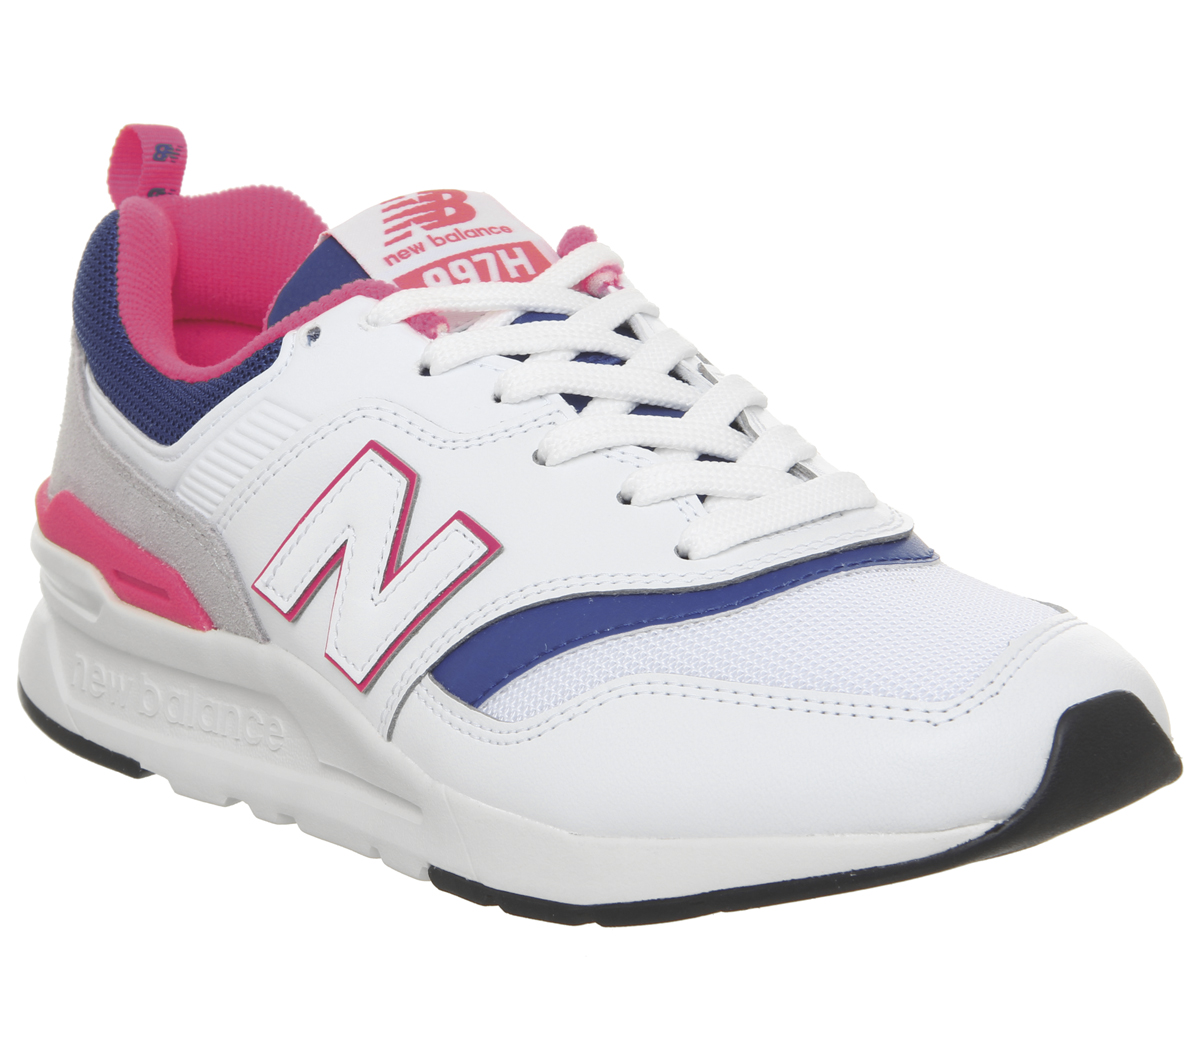 newest dd108 34904 Détails sur New Balance 997 Chaussures Blanches Laser Bleu Baskets